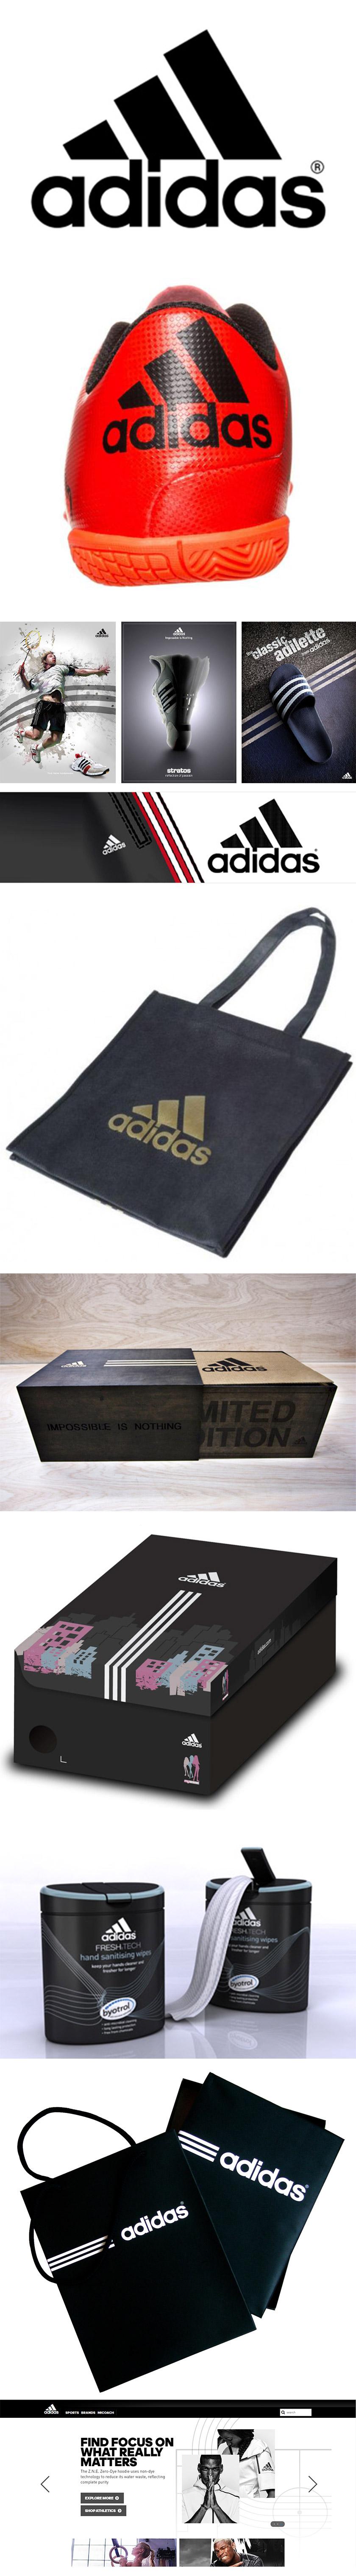 hinh-anh-bai-viet-adidas-zonestyle-thiet-ke-thuong-hieu